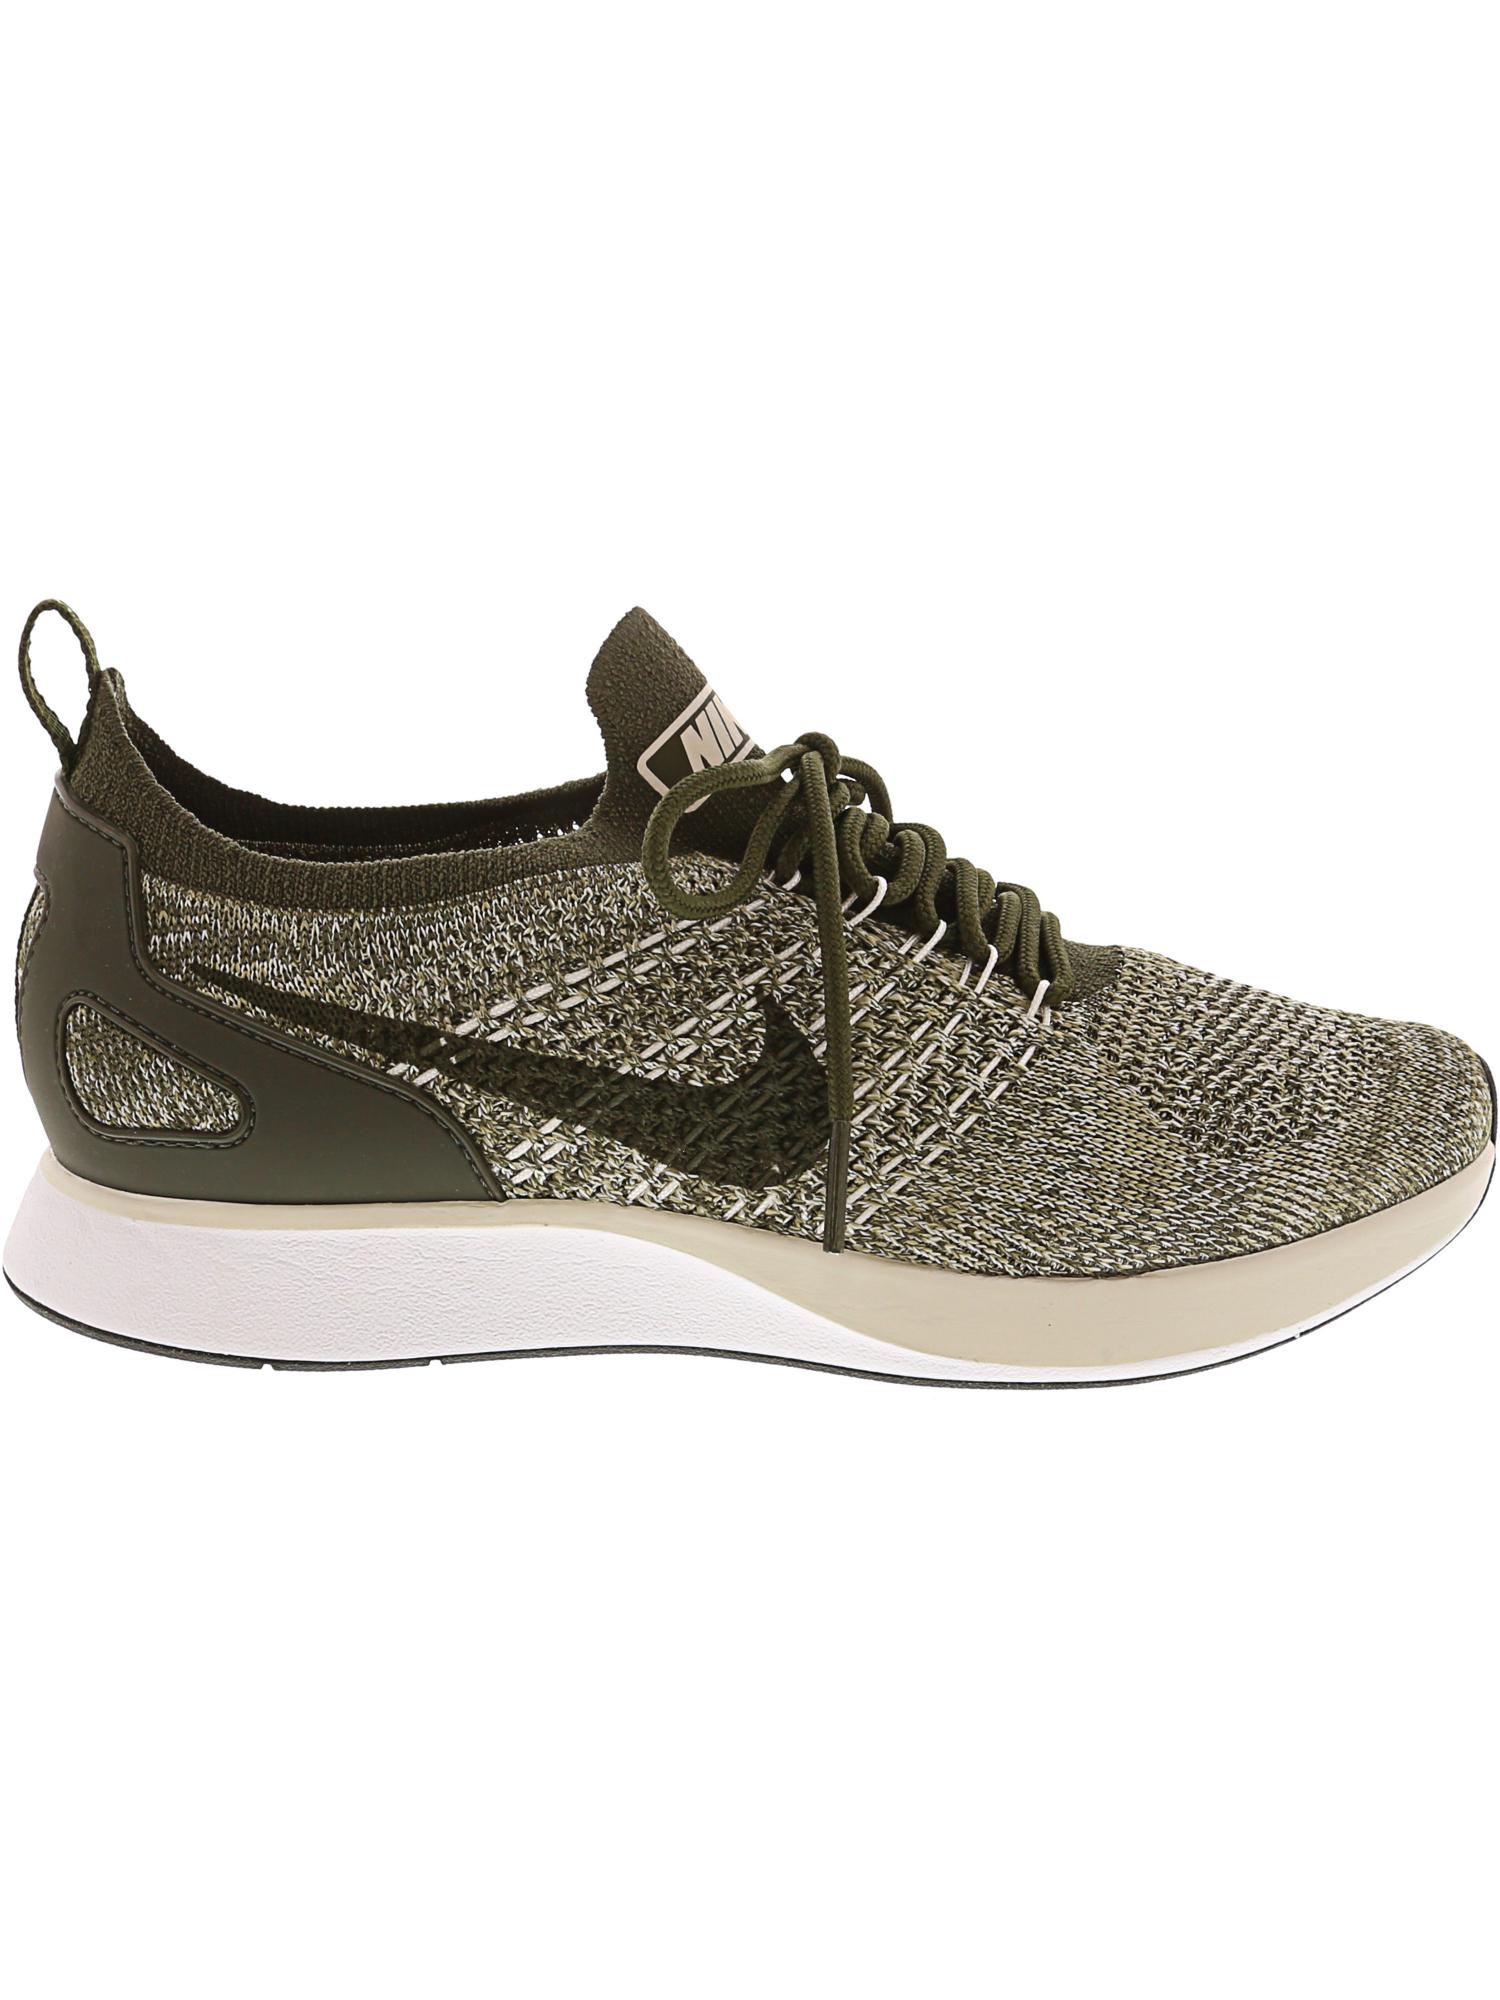 dec390b2d7d Nike Women s Air Zoom Mariah Fk Racer Ankle-High Running Shoe